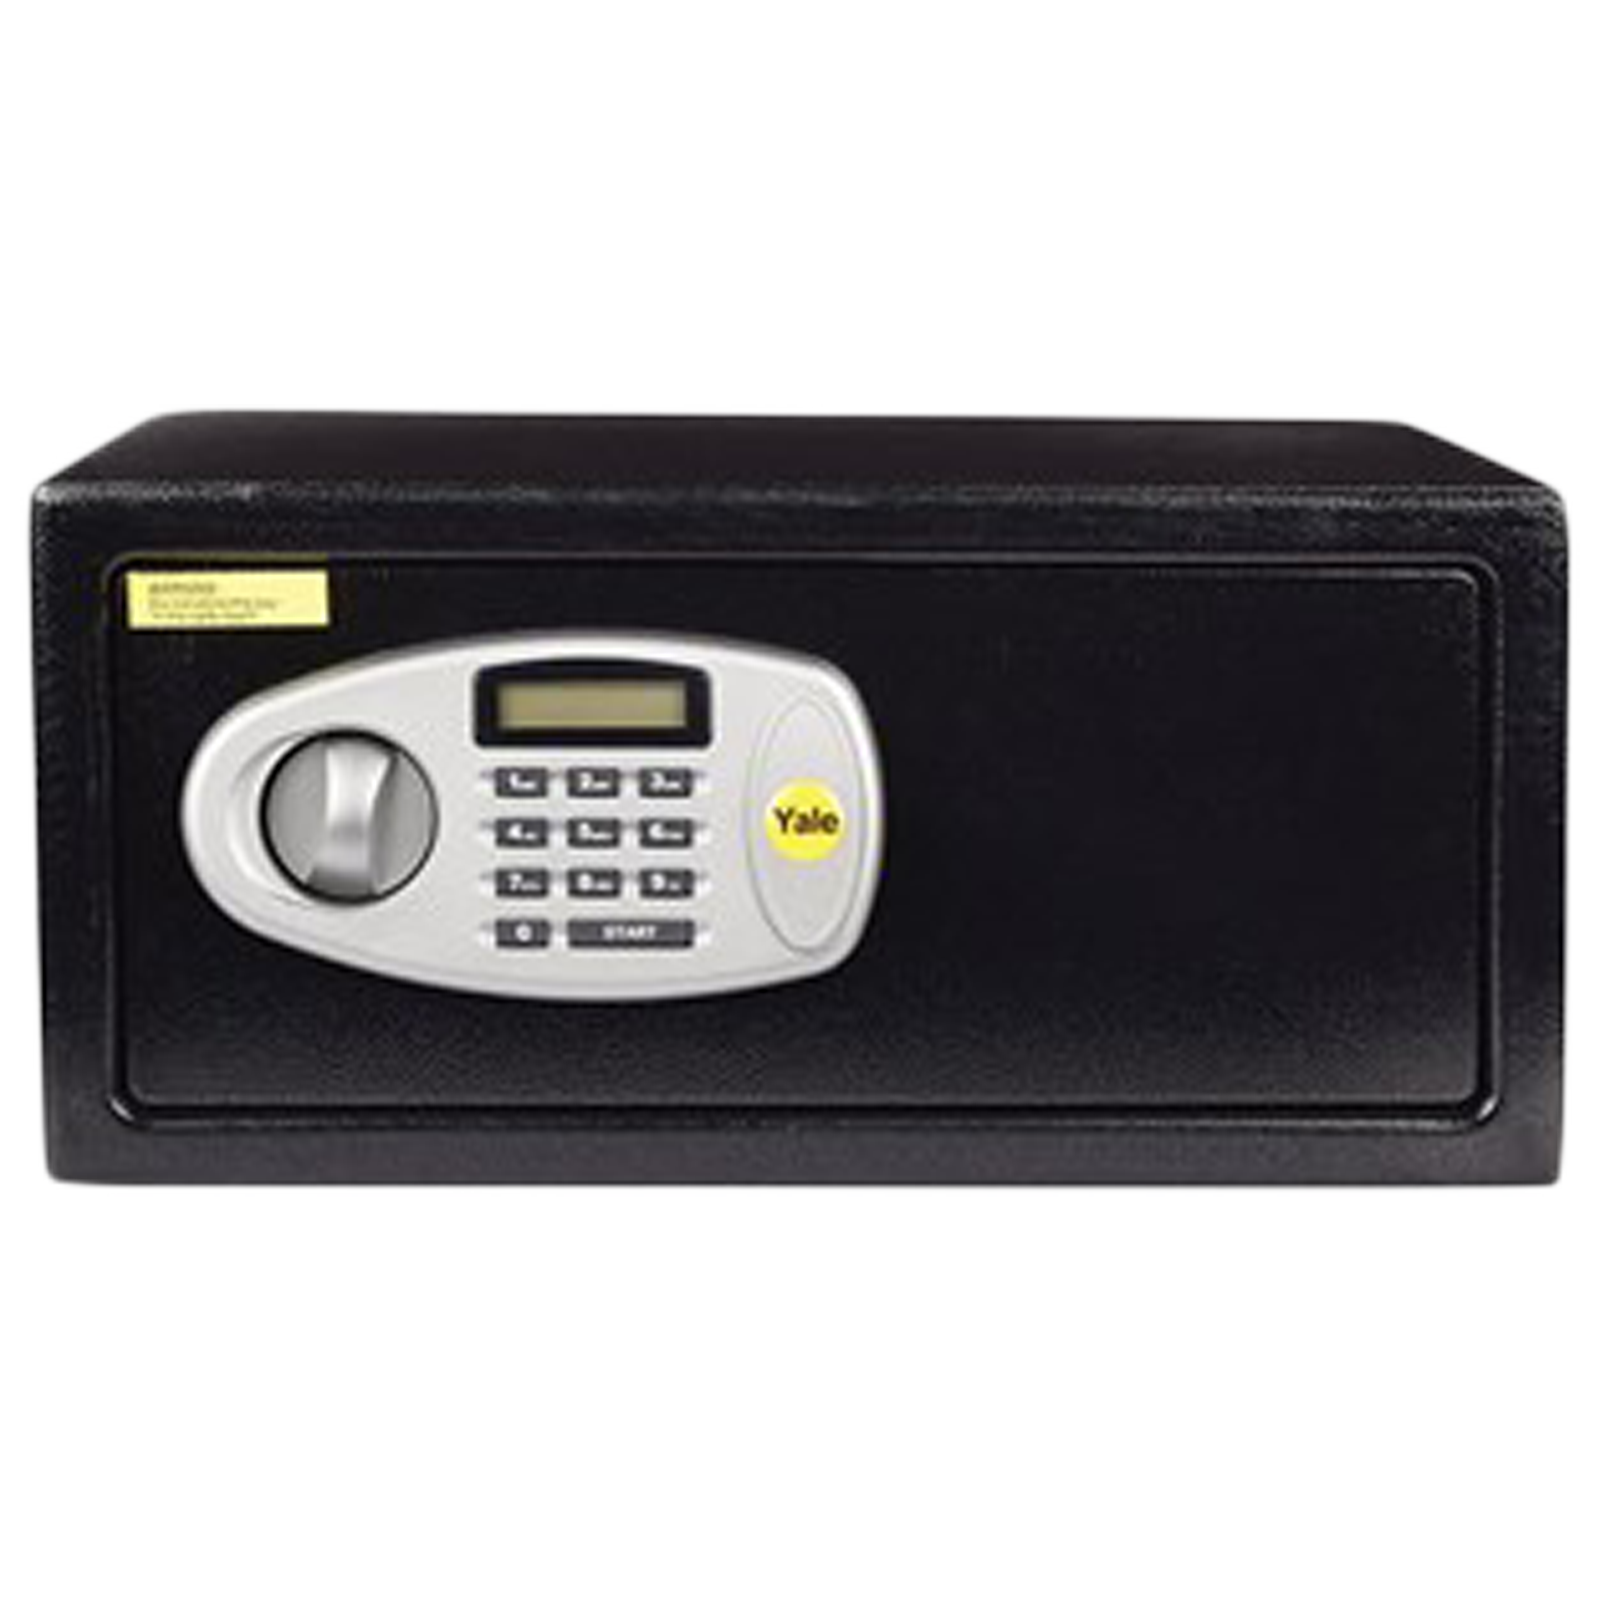 Yale 24.7 Litres Digital Safety Locker (1 Shelve, YLS/200/DB2, Black)_1